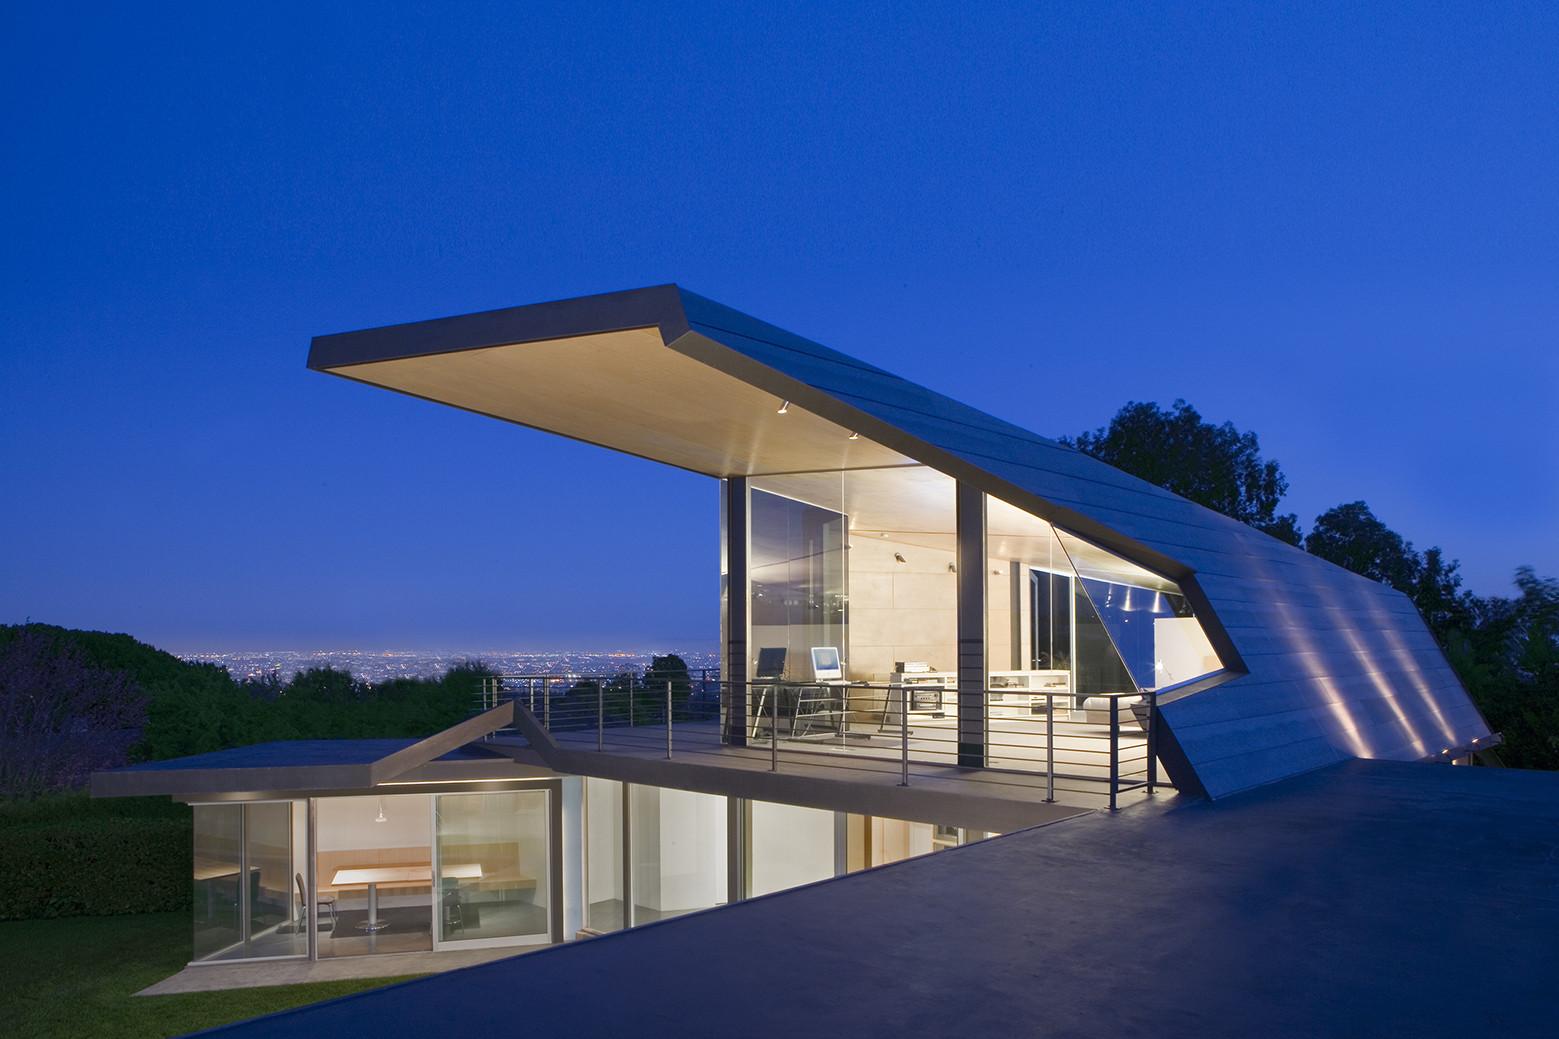 Tigertail / Patrick Tighe Architecture